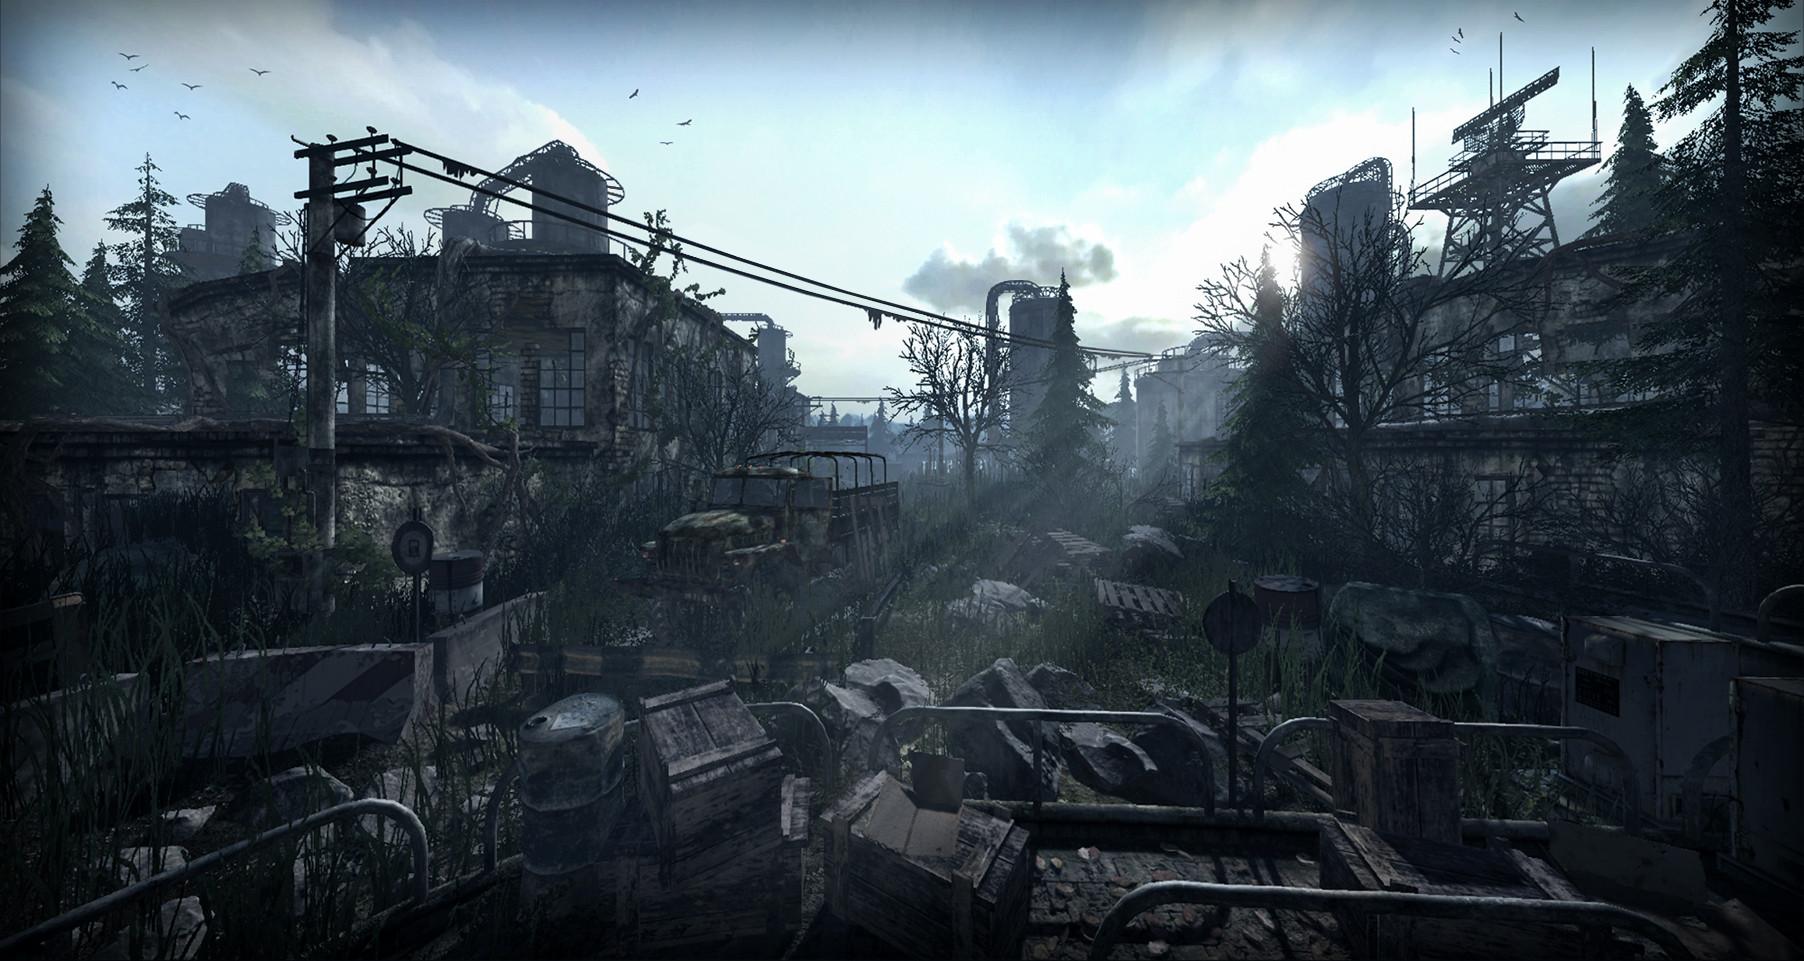 Robert max ramirez abandoned factory 2